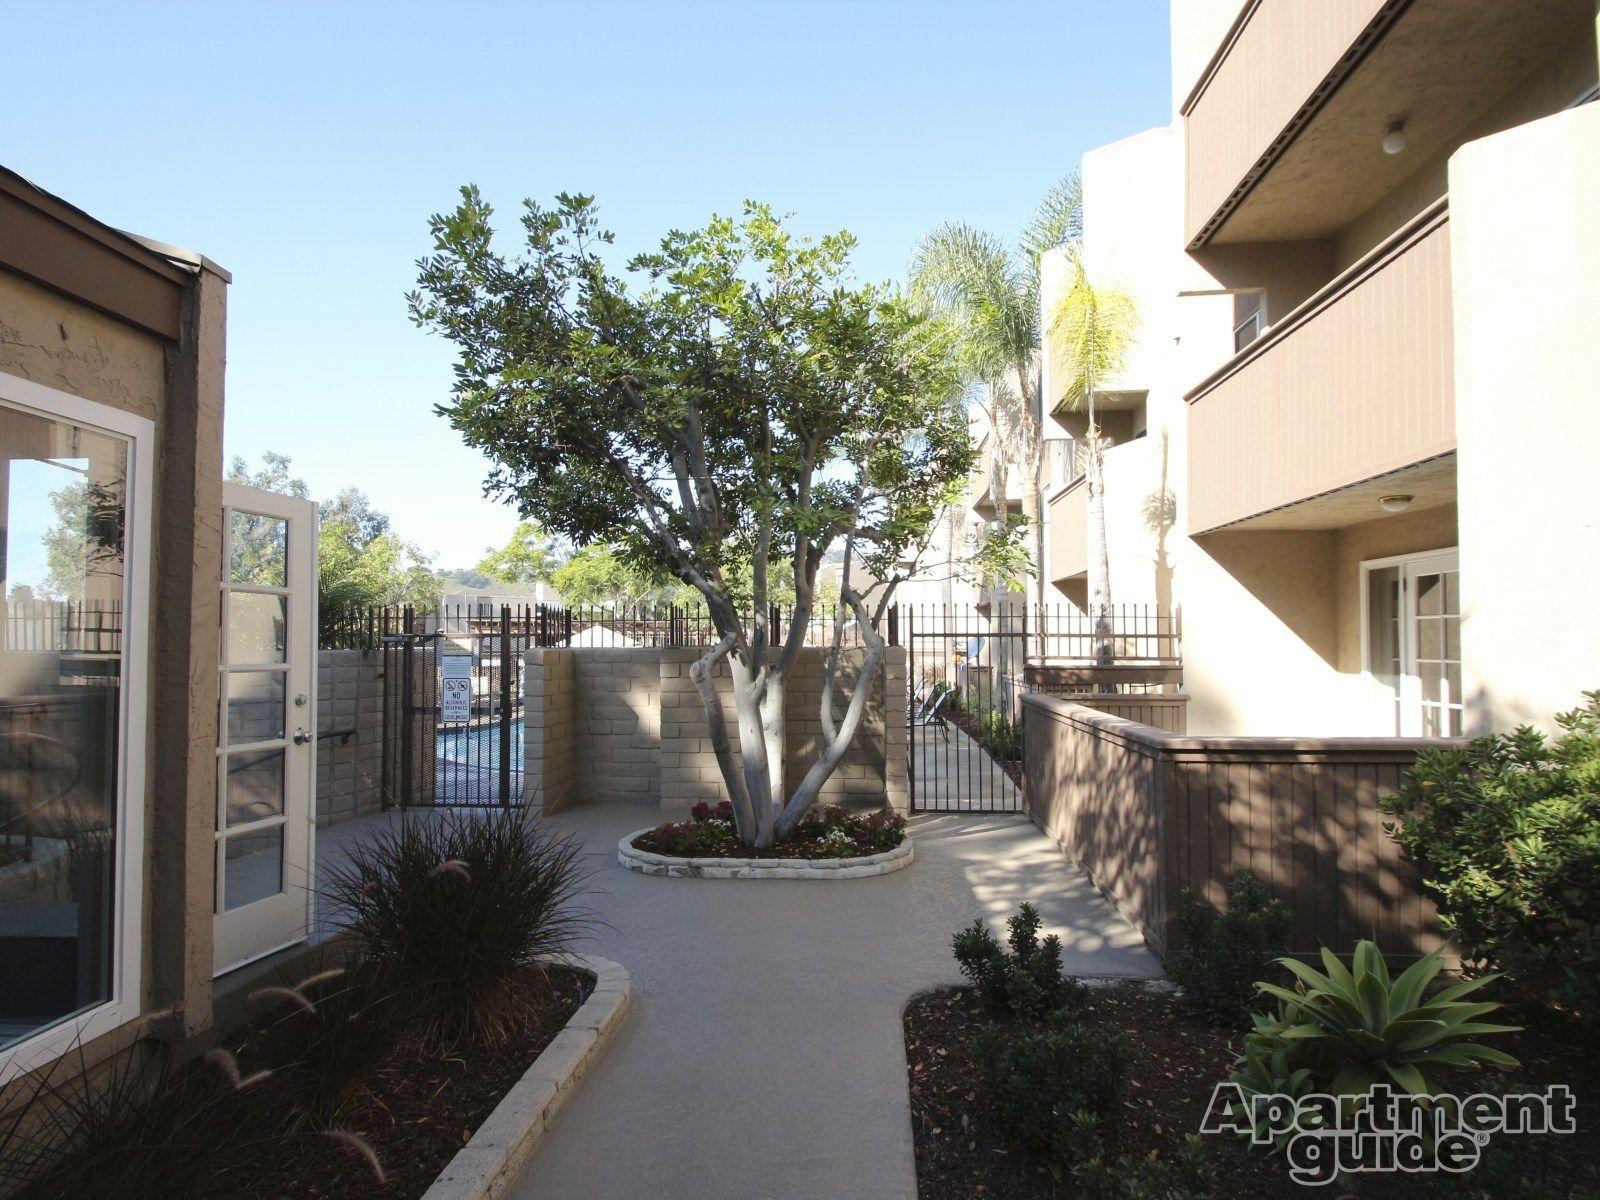 Pacific Bay Club Apartments San Diego Ca 92117 Apartments For Rent San Diego Pacific Bay